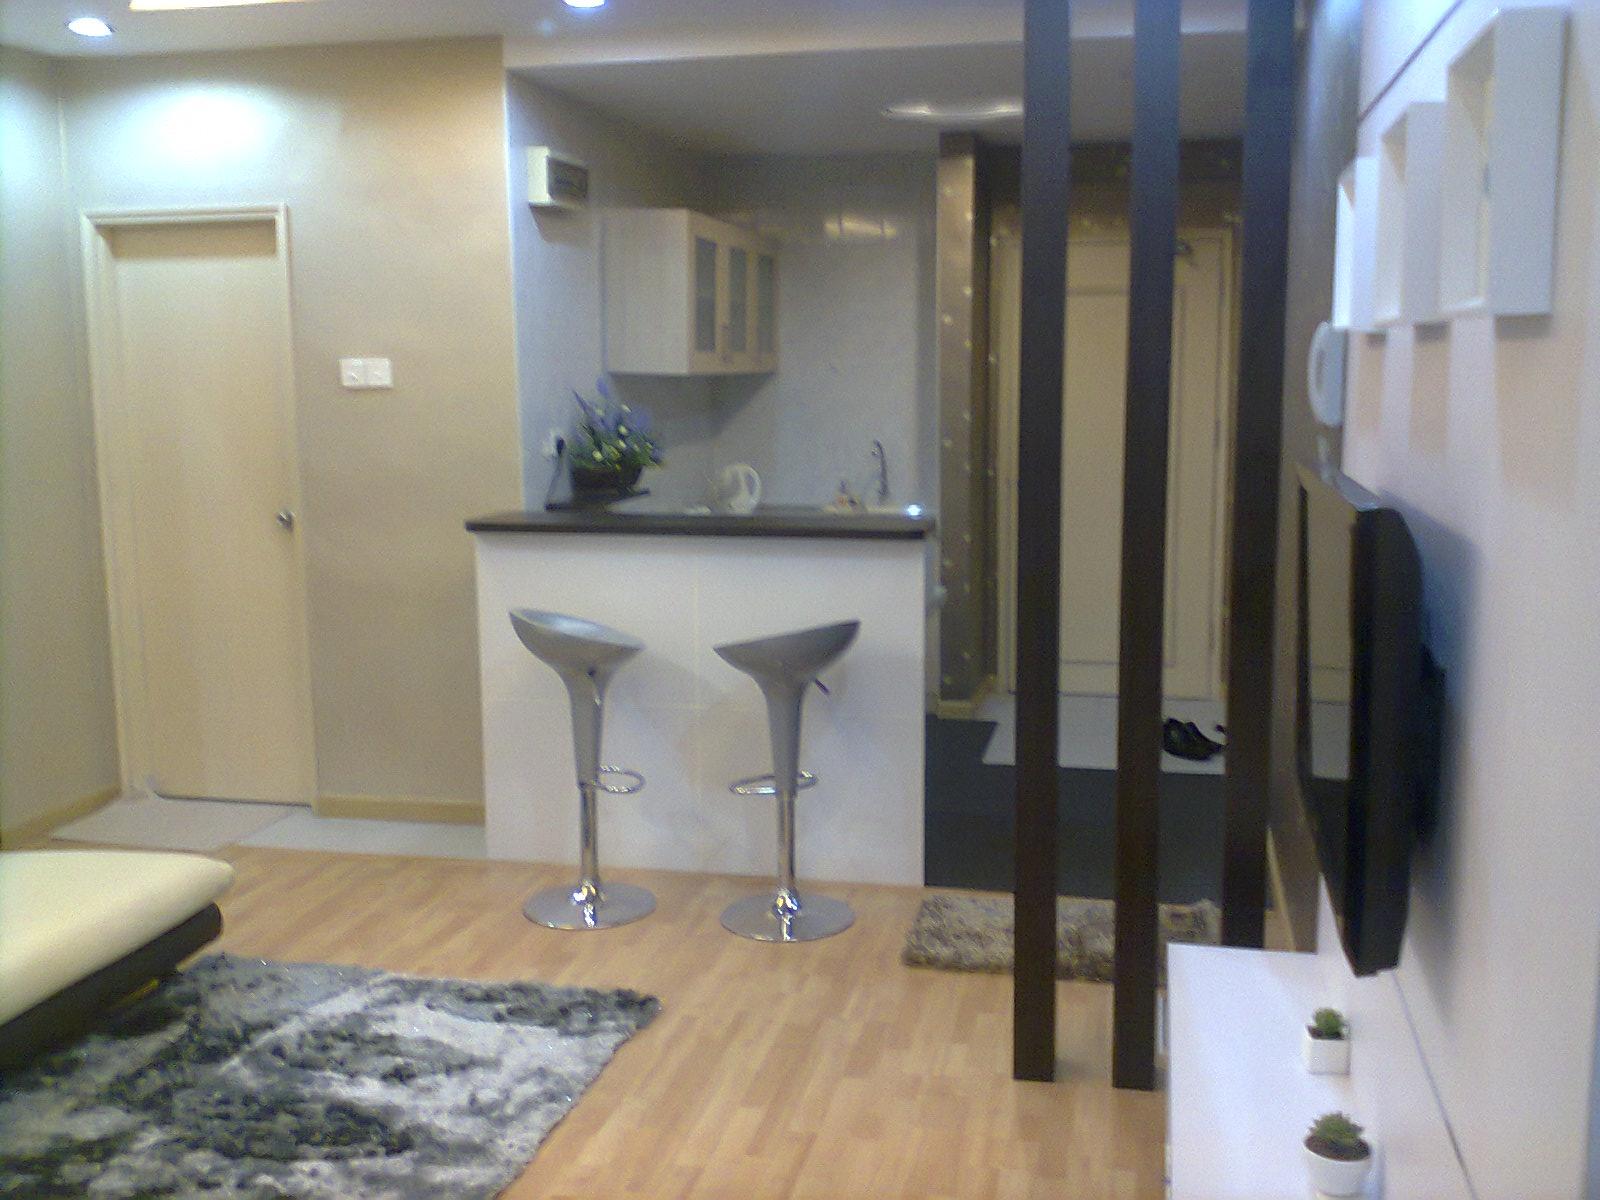 Executive Studio Apartment For Rent At Prima Regency Taman Molek Johor Bahru Rm1800 Mth Rm195k Non I Lot Ing Price